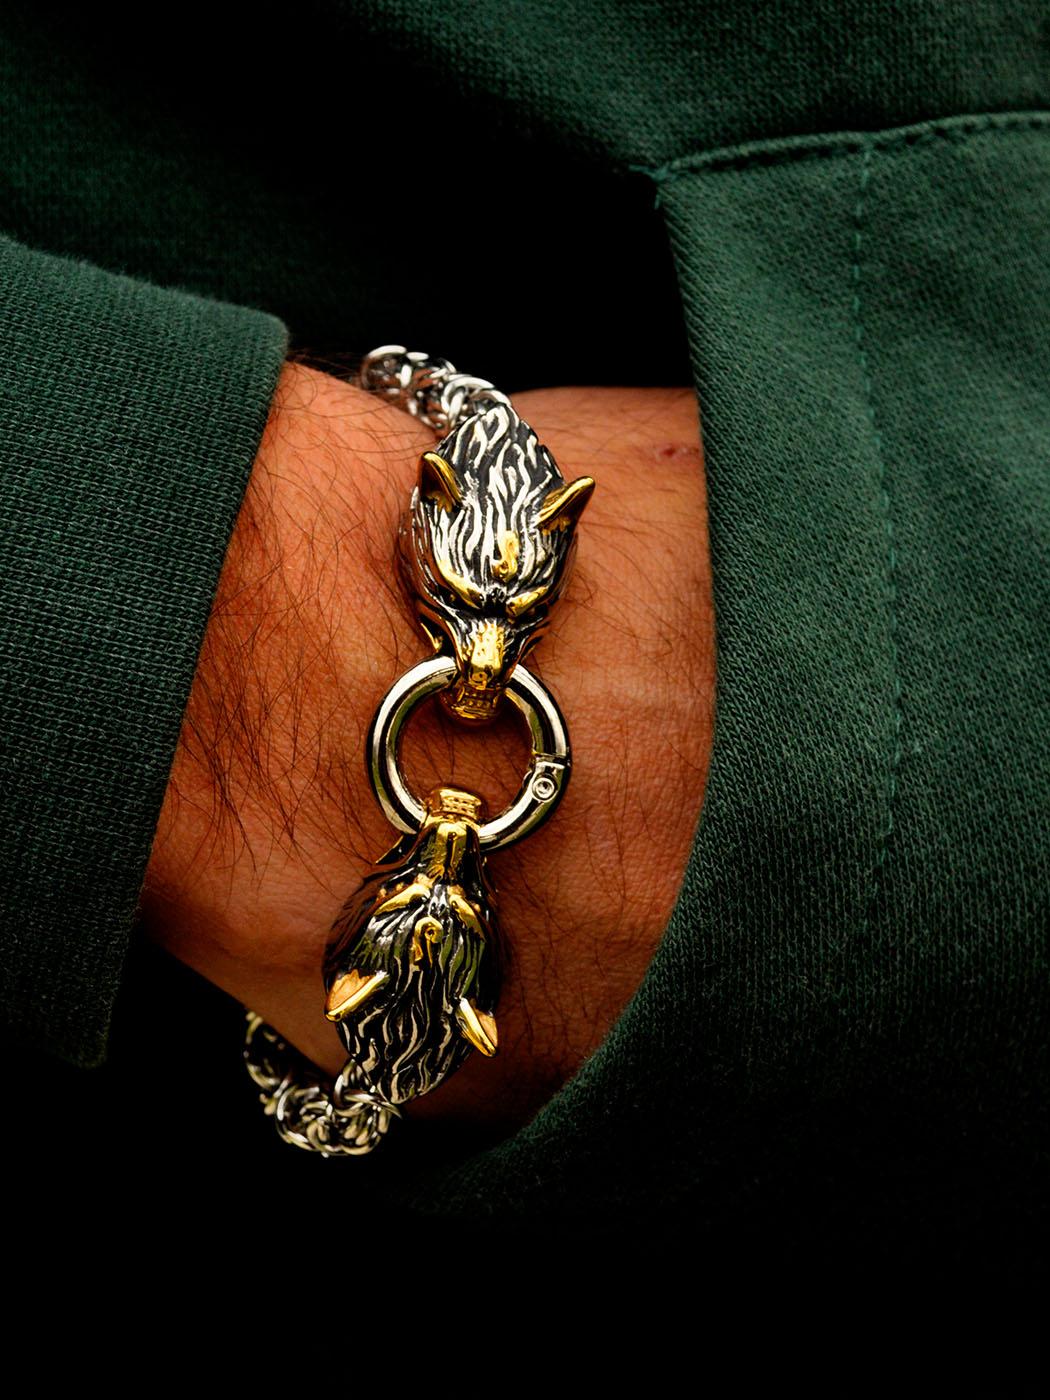 Wolf Wristband Amazon Deals New York